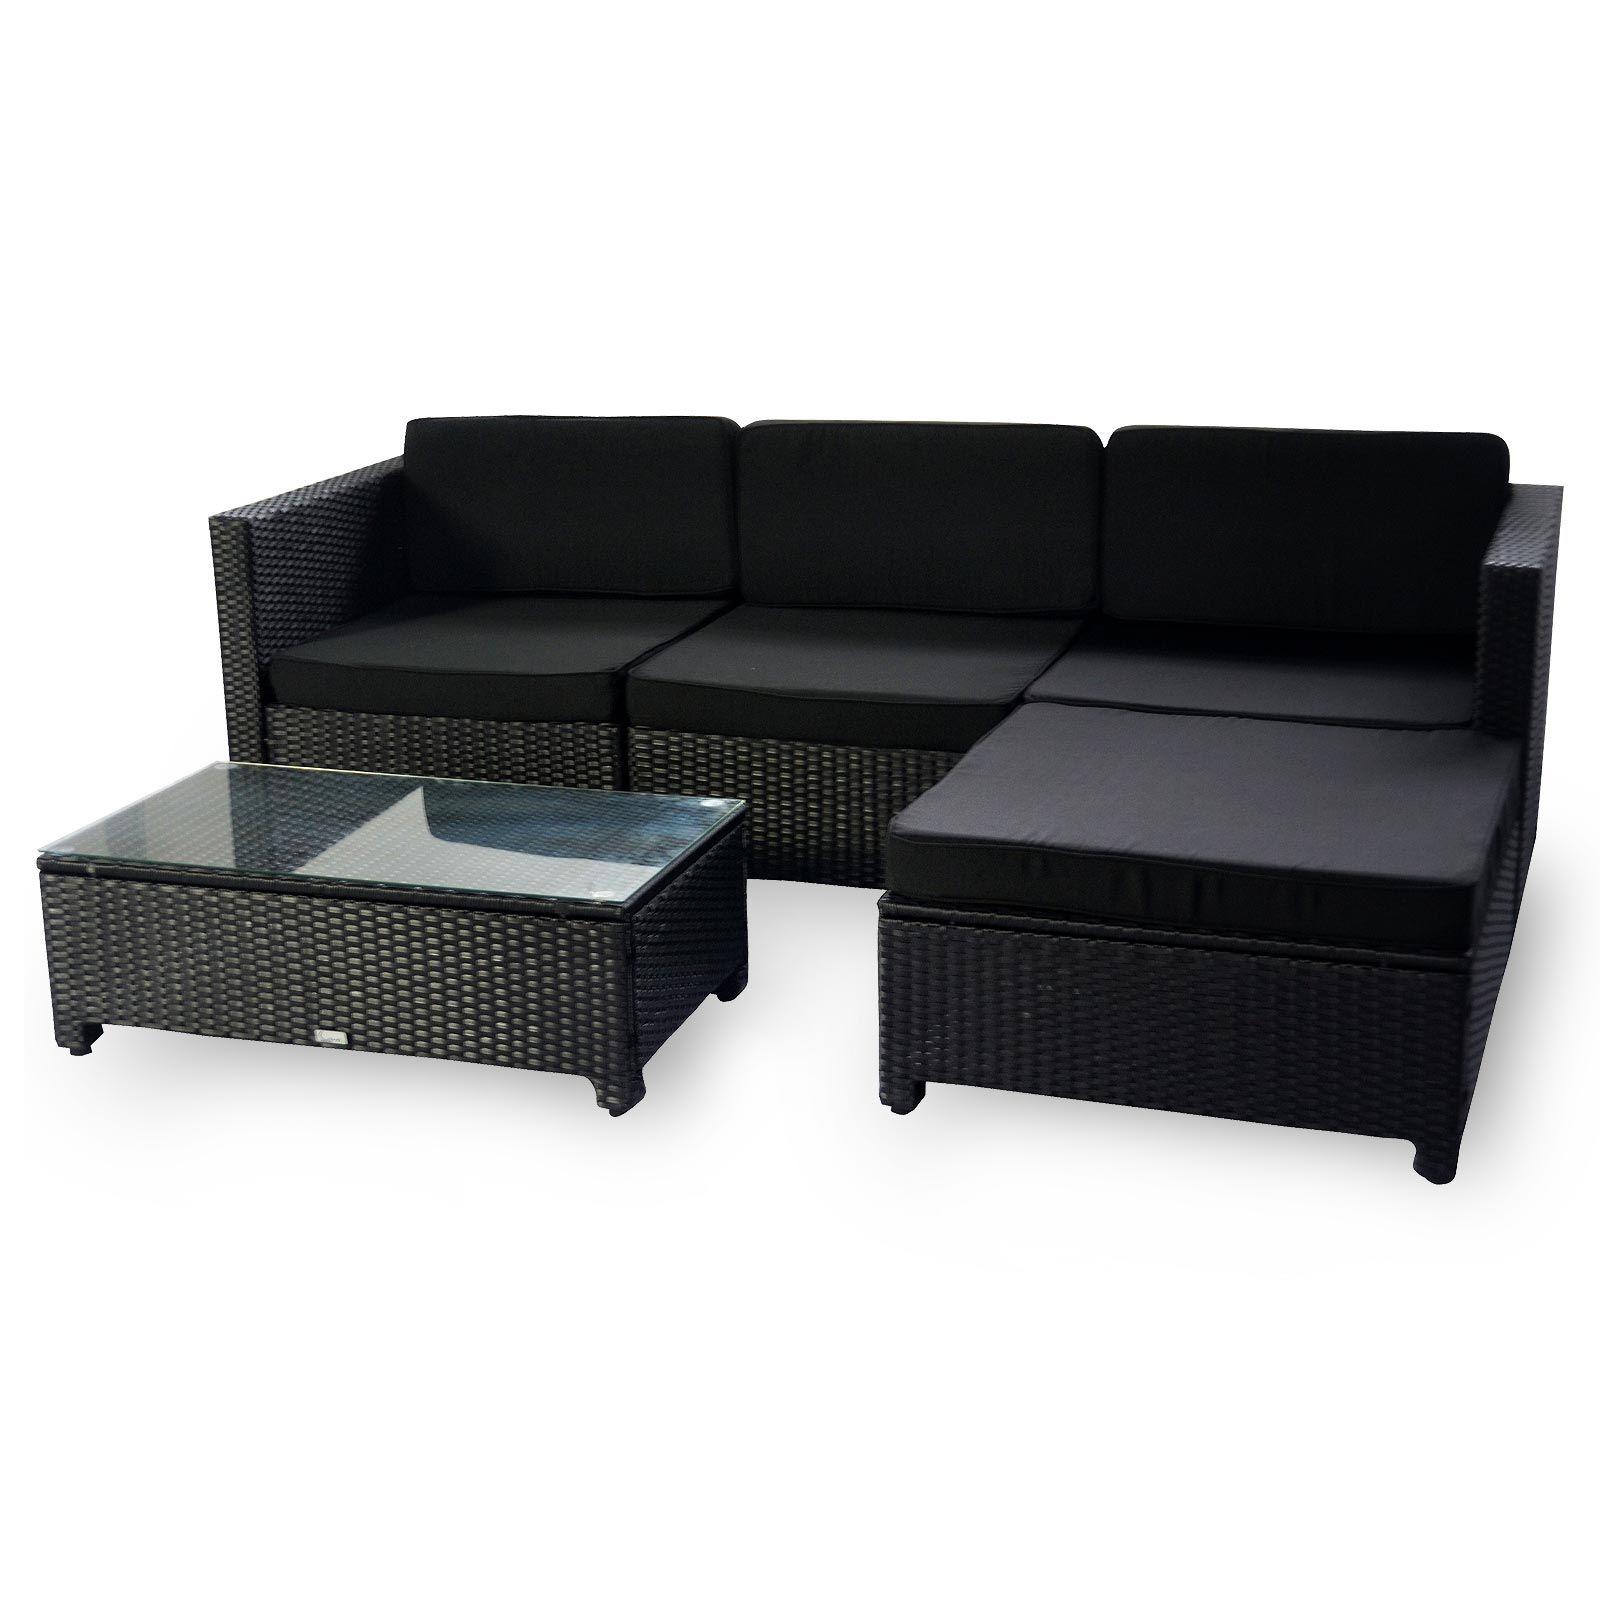 cheap sofas online australia sofa bed childrens bedroom luxo milton modular outdoor set black pinterest buy